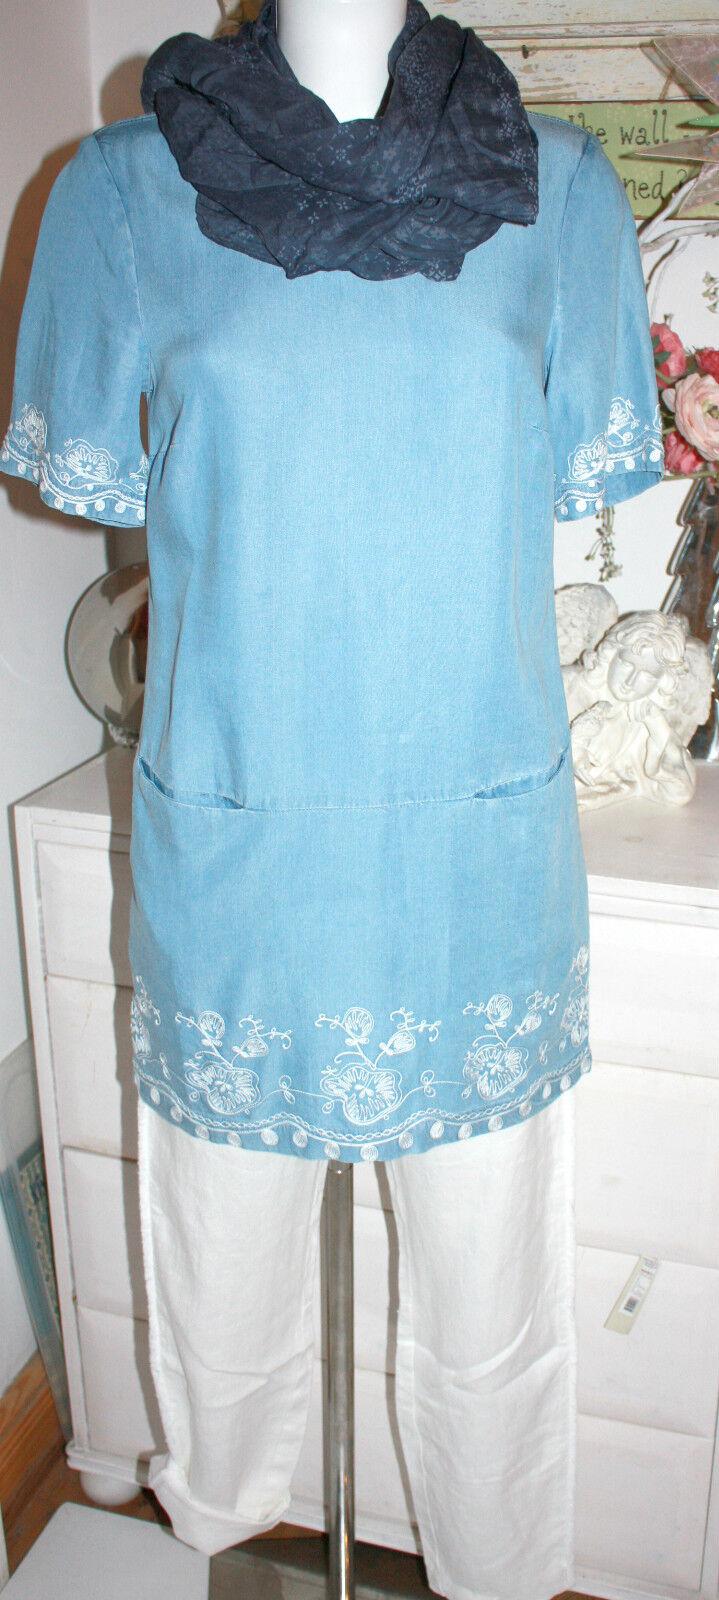 Weiß Stuff Tunika  Blause Kurzarm Denim Blau  Worthwile Tunic  Größe  8  XS Neu